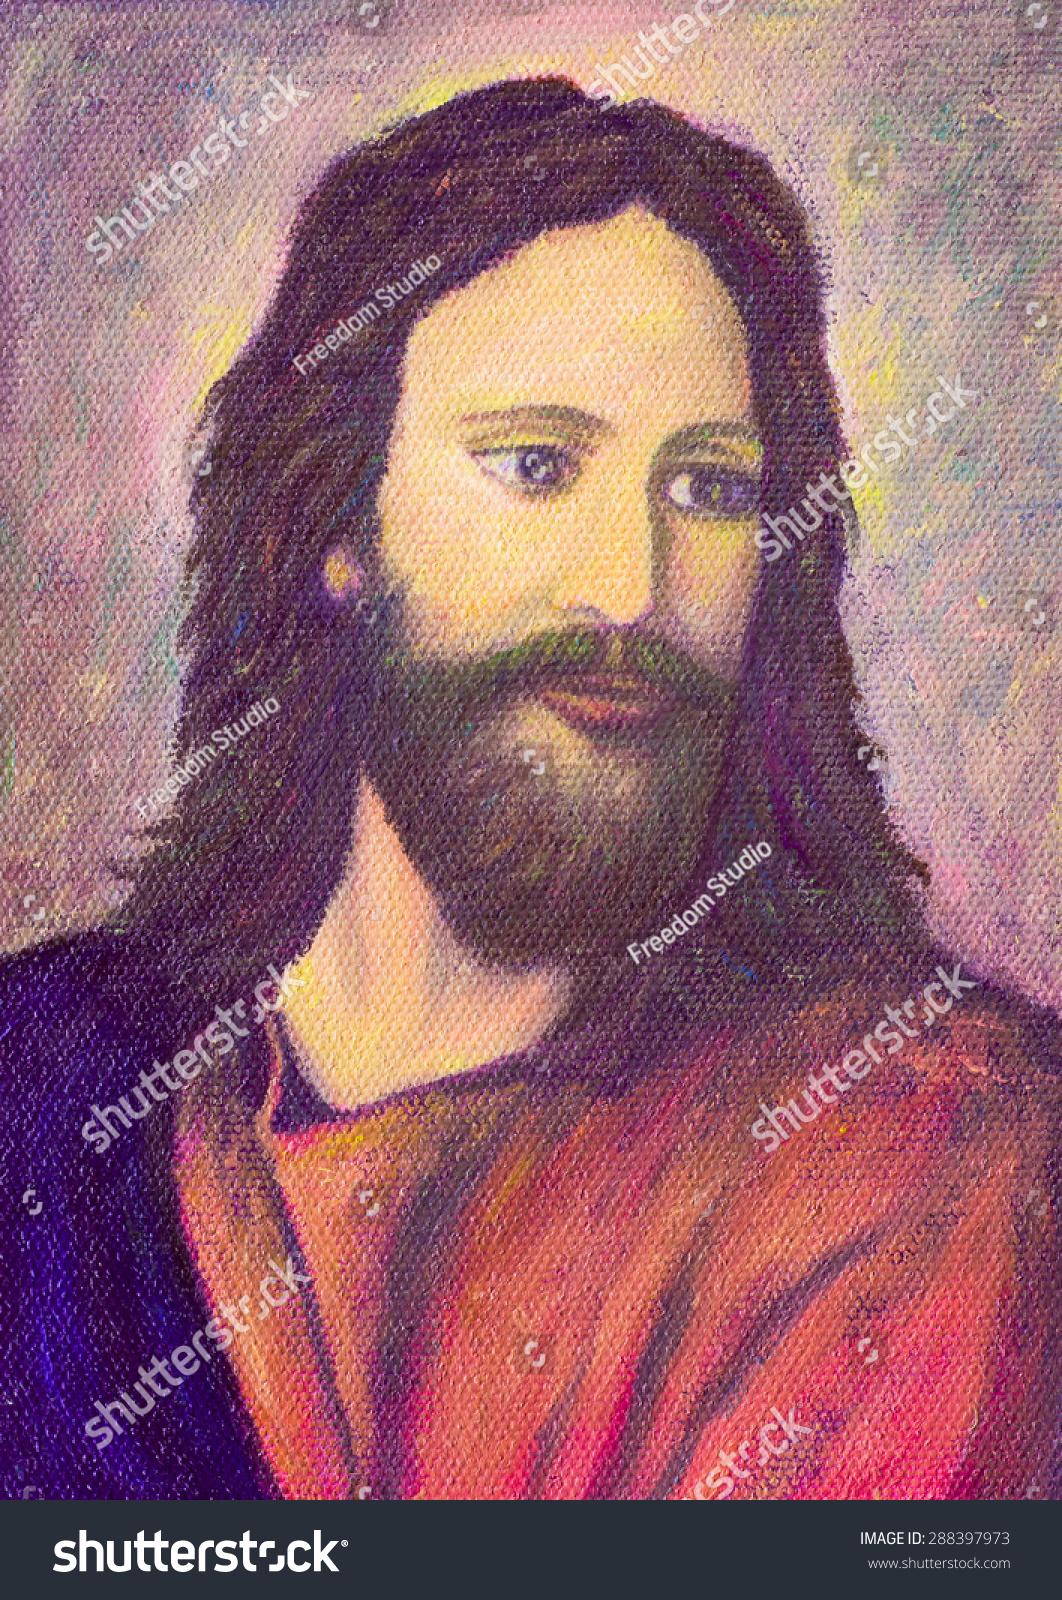 Royalty Free Stock Illustration of Portrait Jesus Christ Original ...